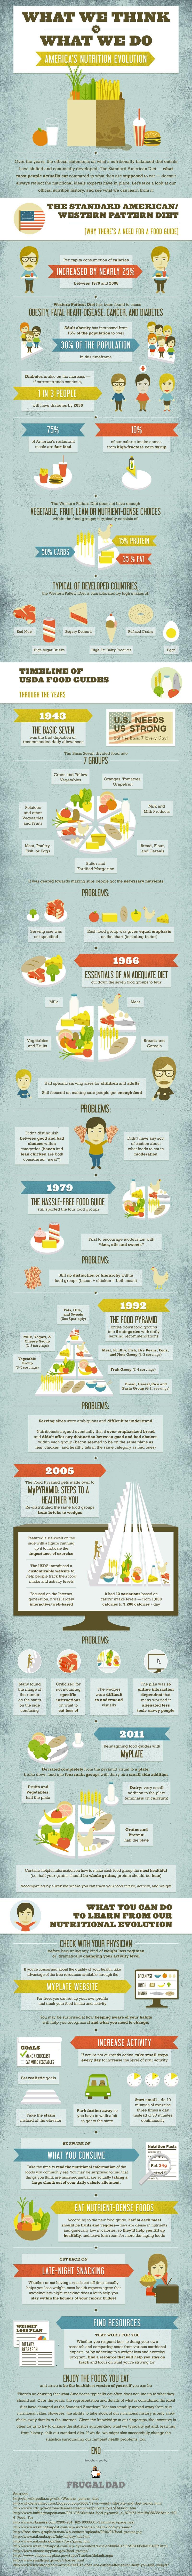 America's Disturbing Nutritional Evolution Infographic